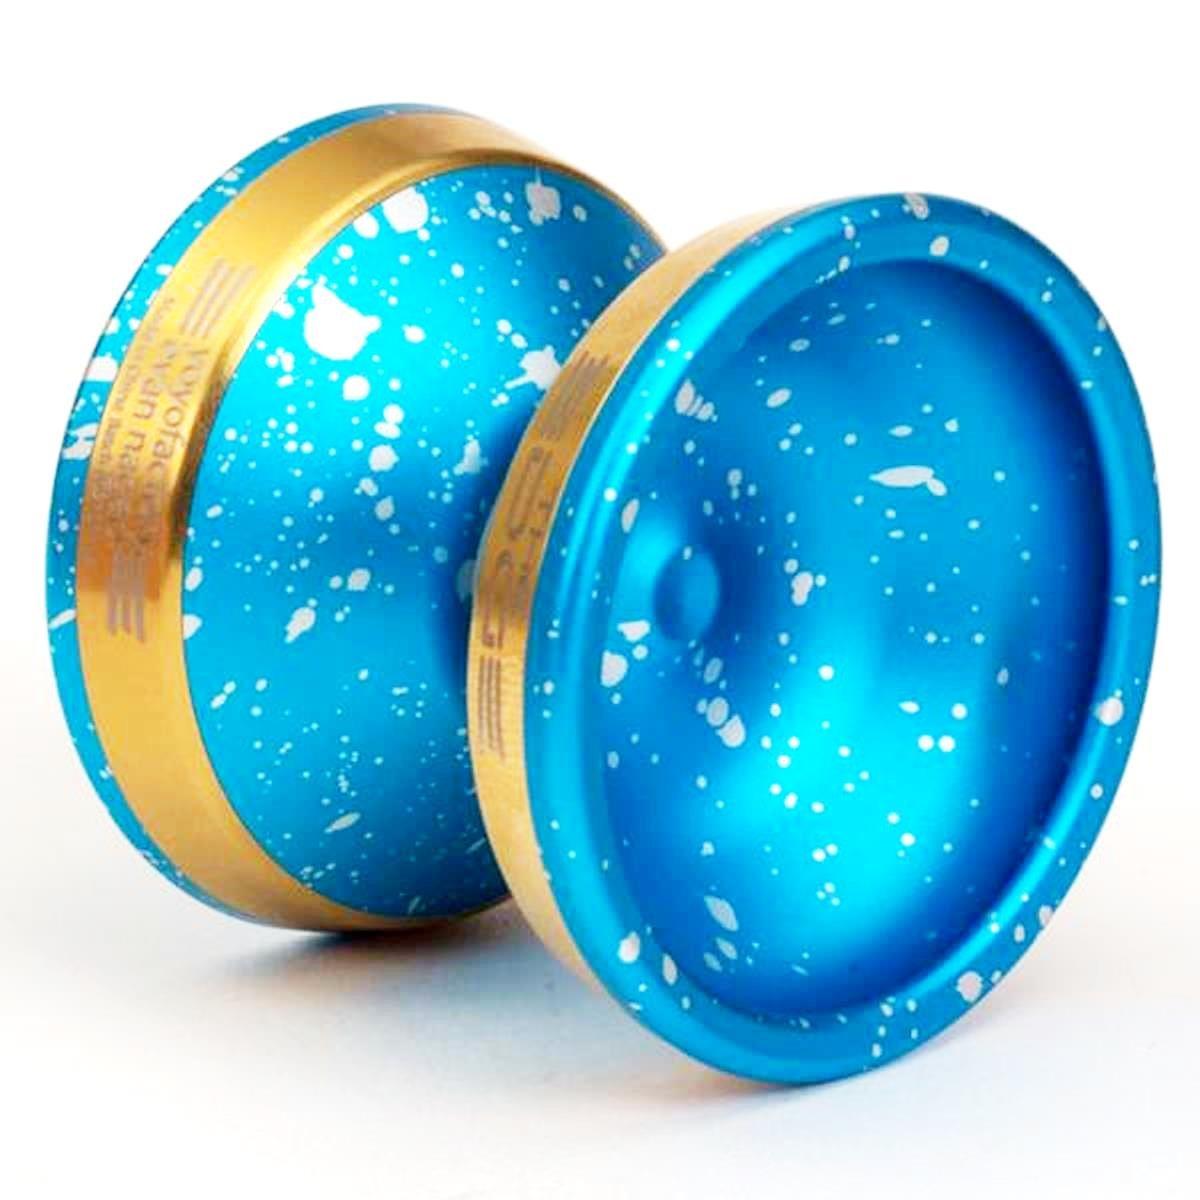 Edge Yoyo by YoYoFactory Color Blue Acid Wash with Gold Edge Rims